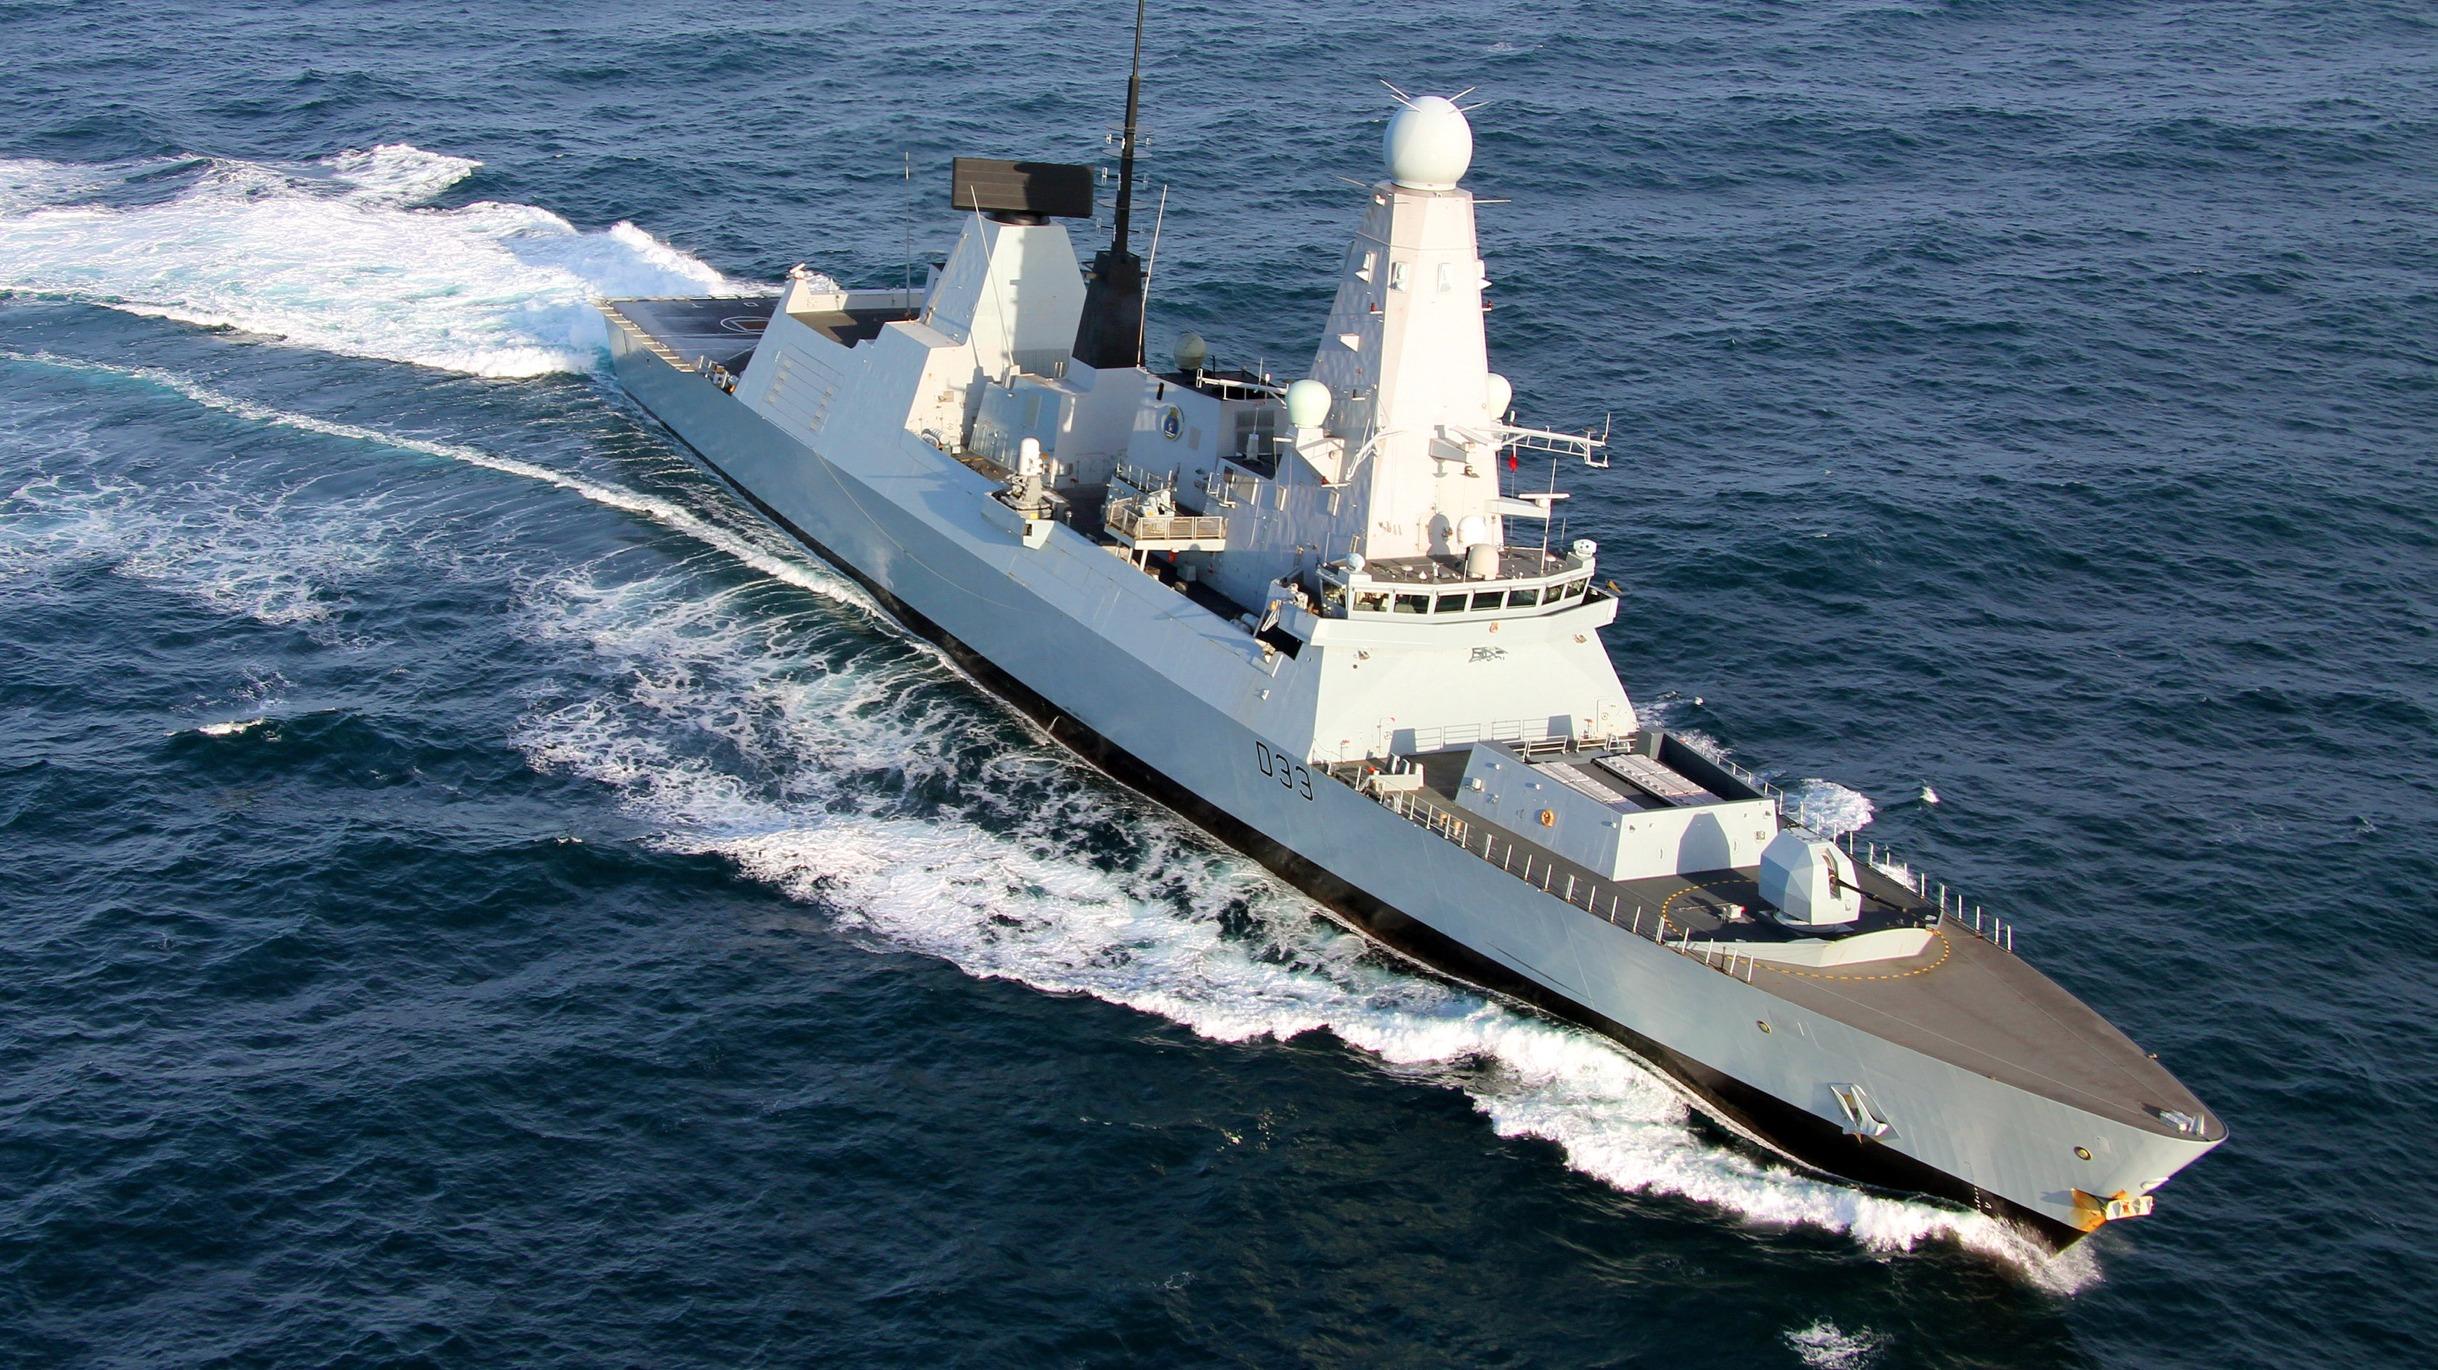 type 45 destroyer hms dauntless enjoys the gulf in dubai